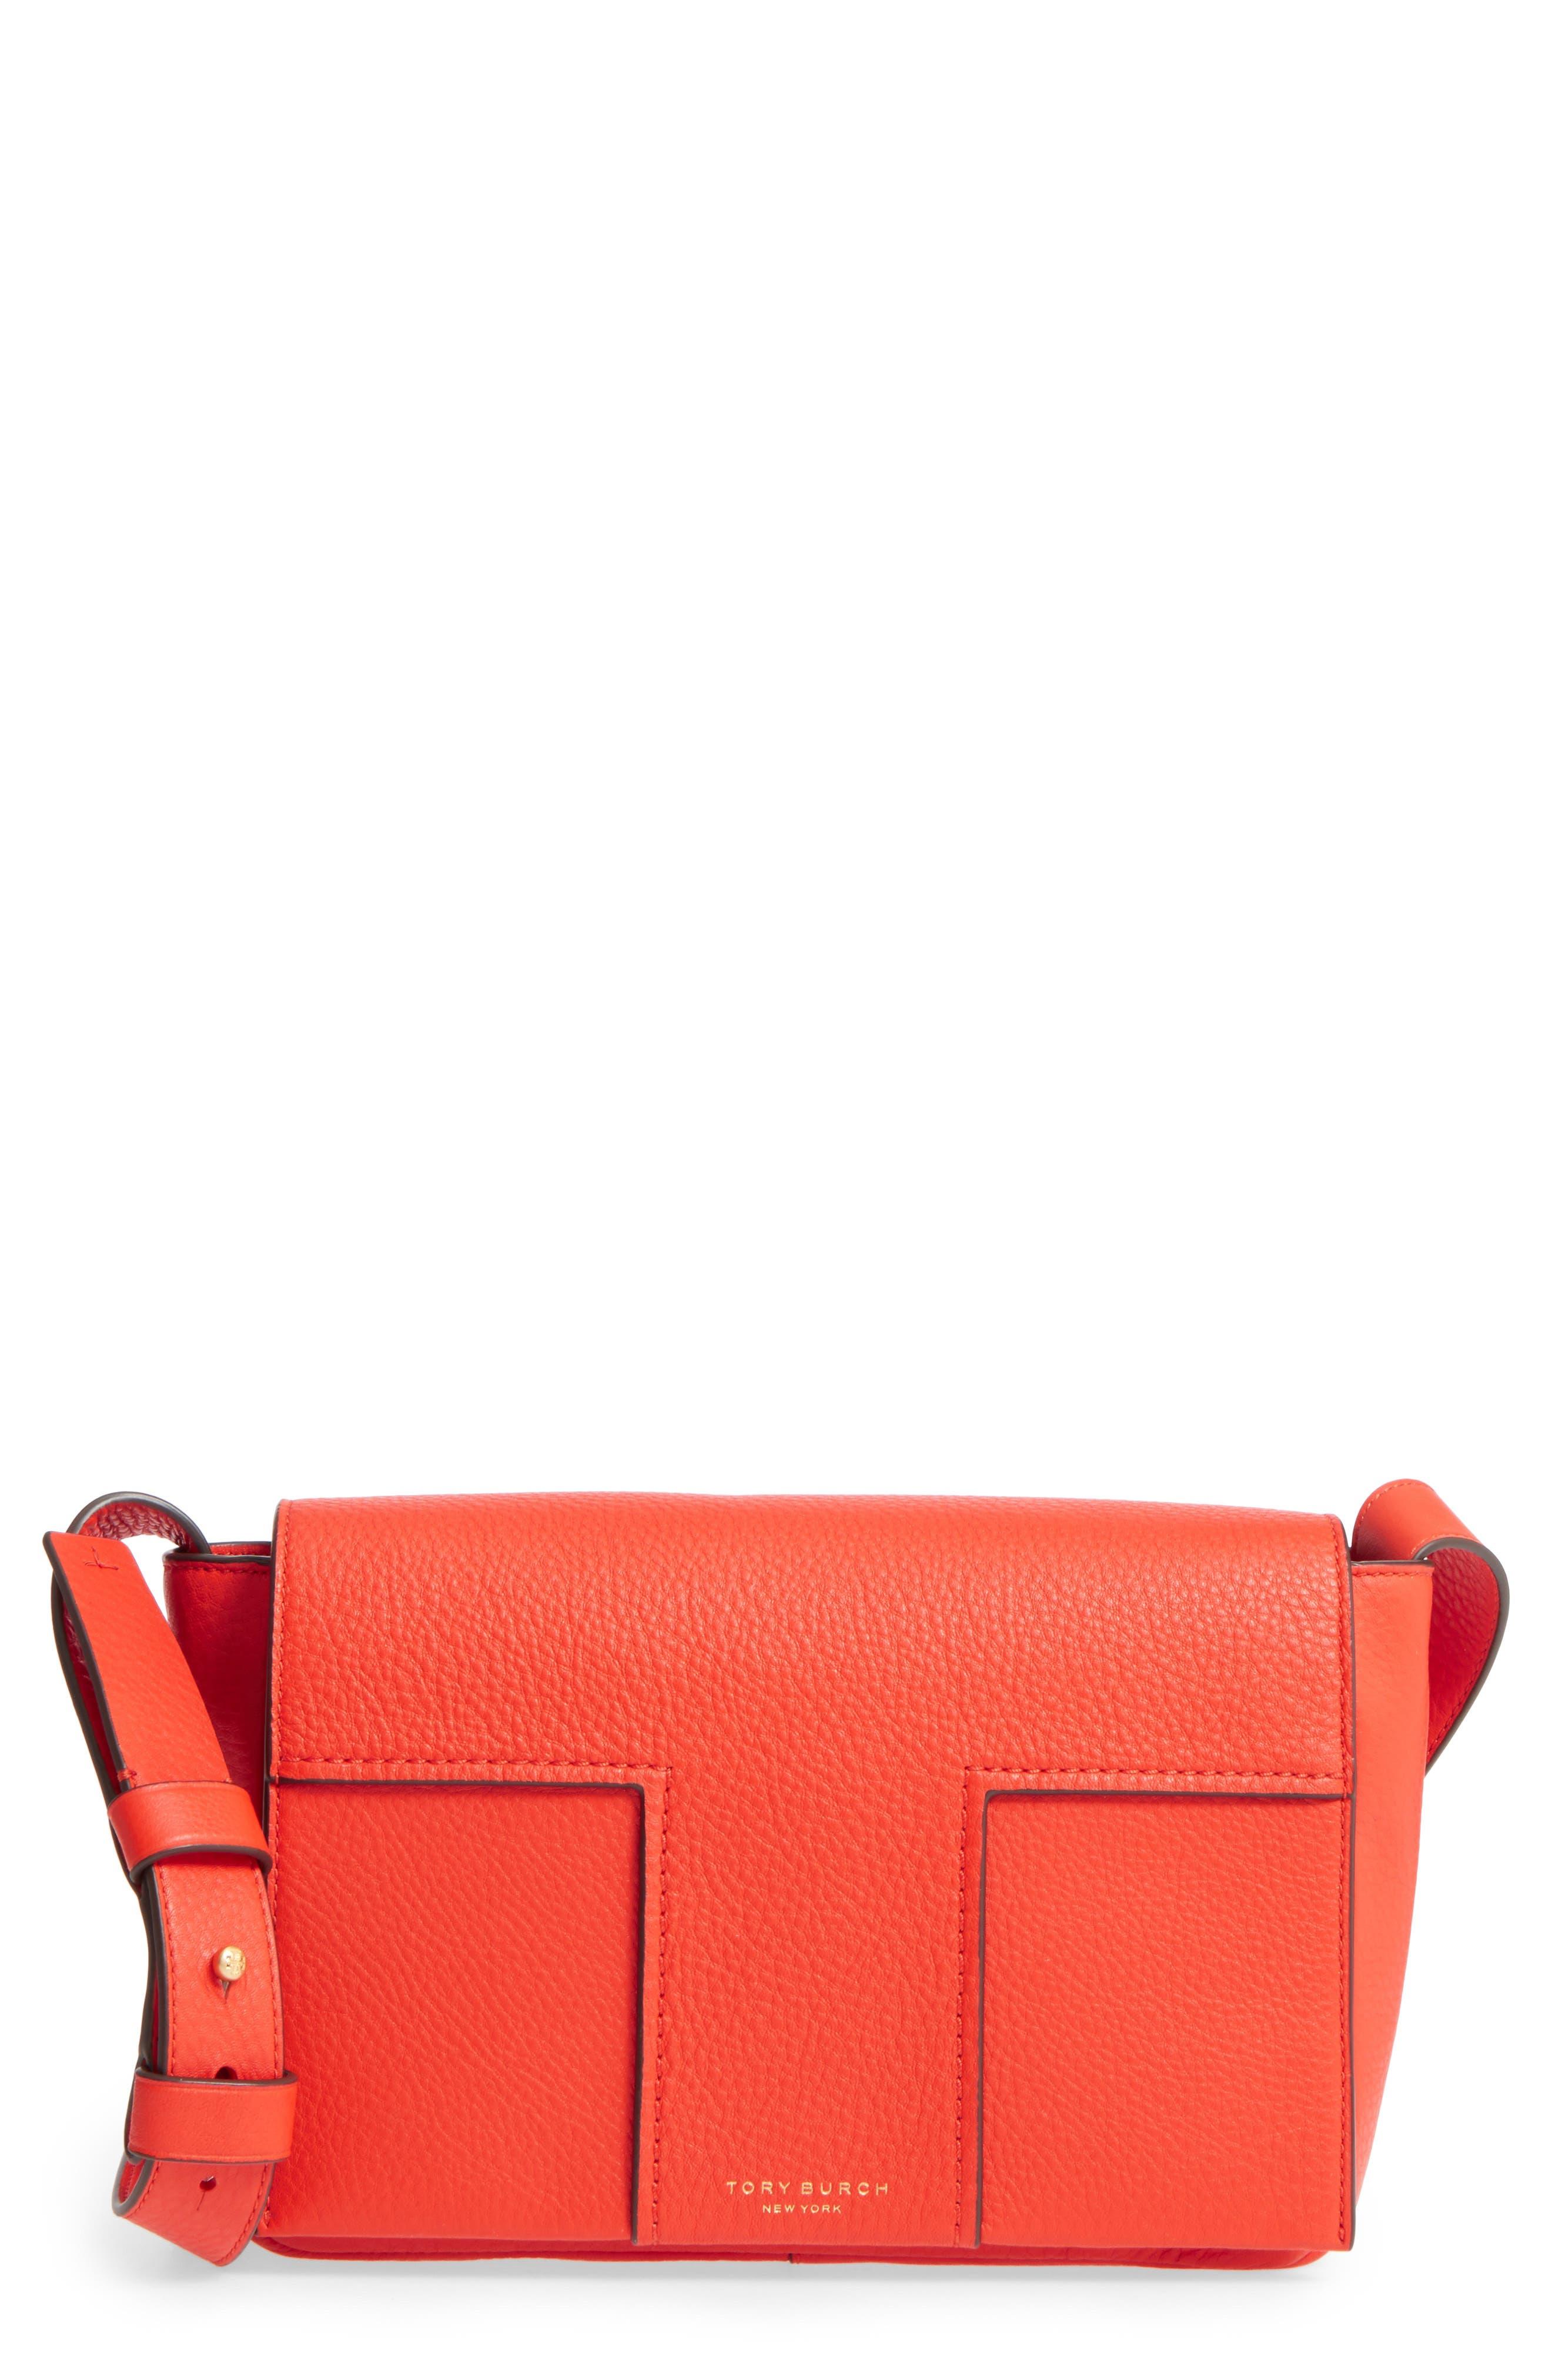 Block-T Pebbled Leather Shoulder Bag,                             Main thumbnail 1, color,                             Spicy Orange